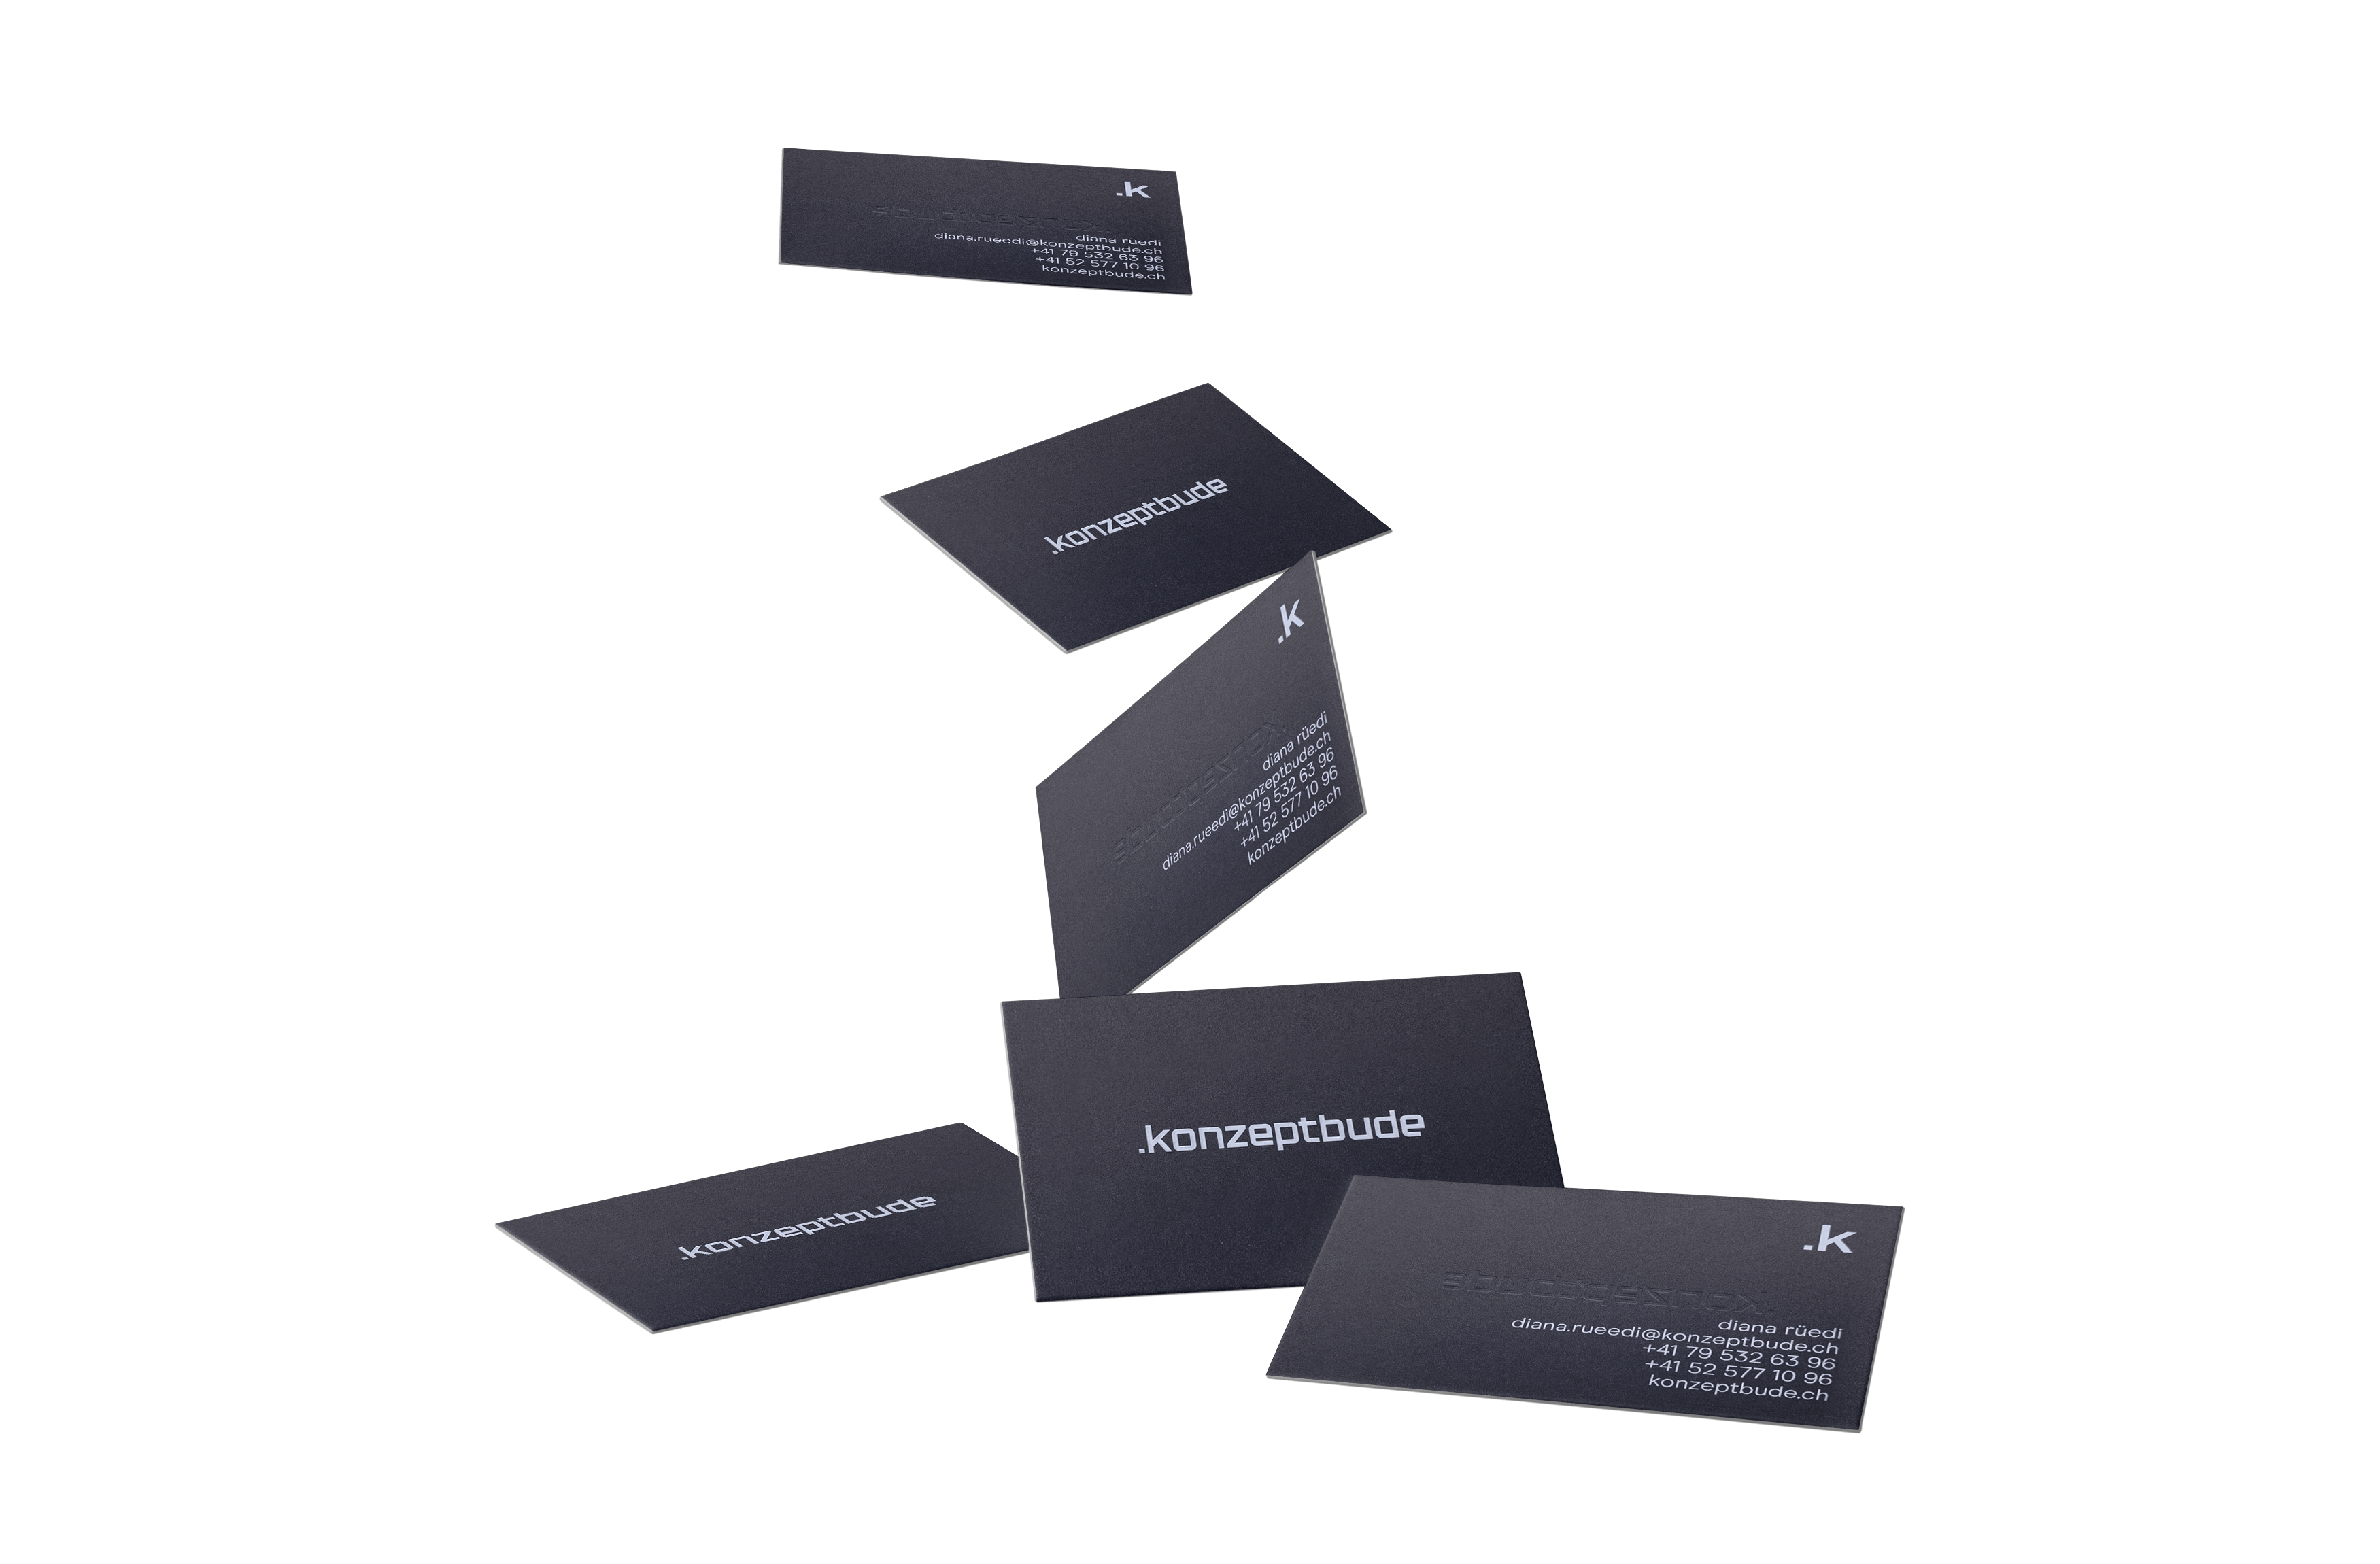 Konzeptbude, Branding, Schaffhausen, Format Studio, Visitenkarten